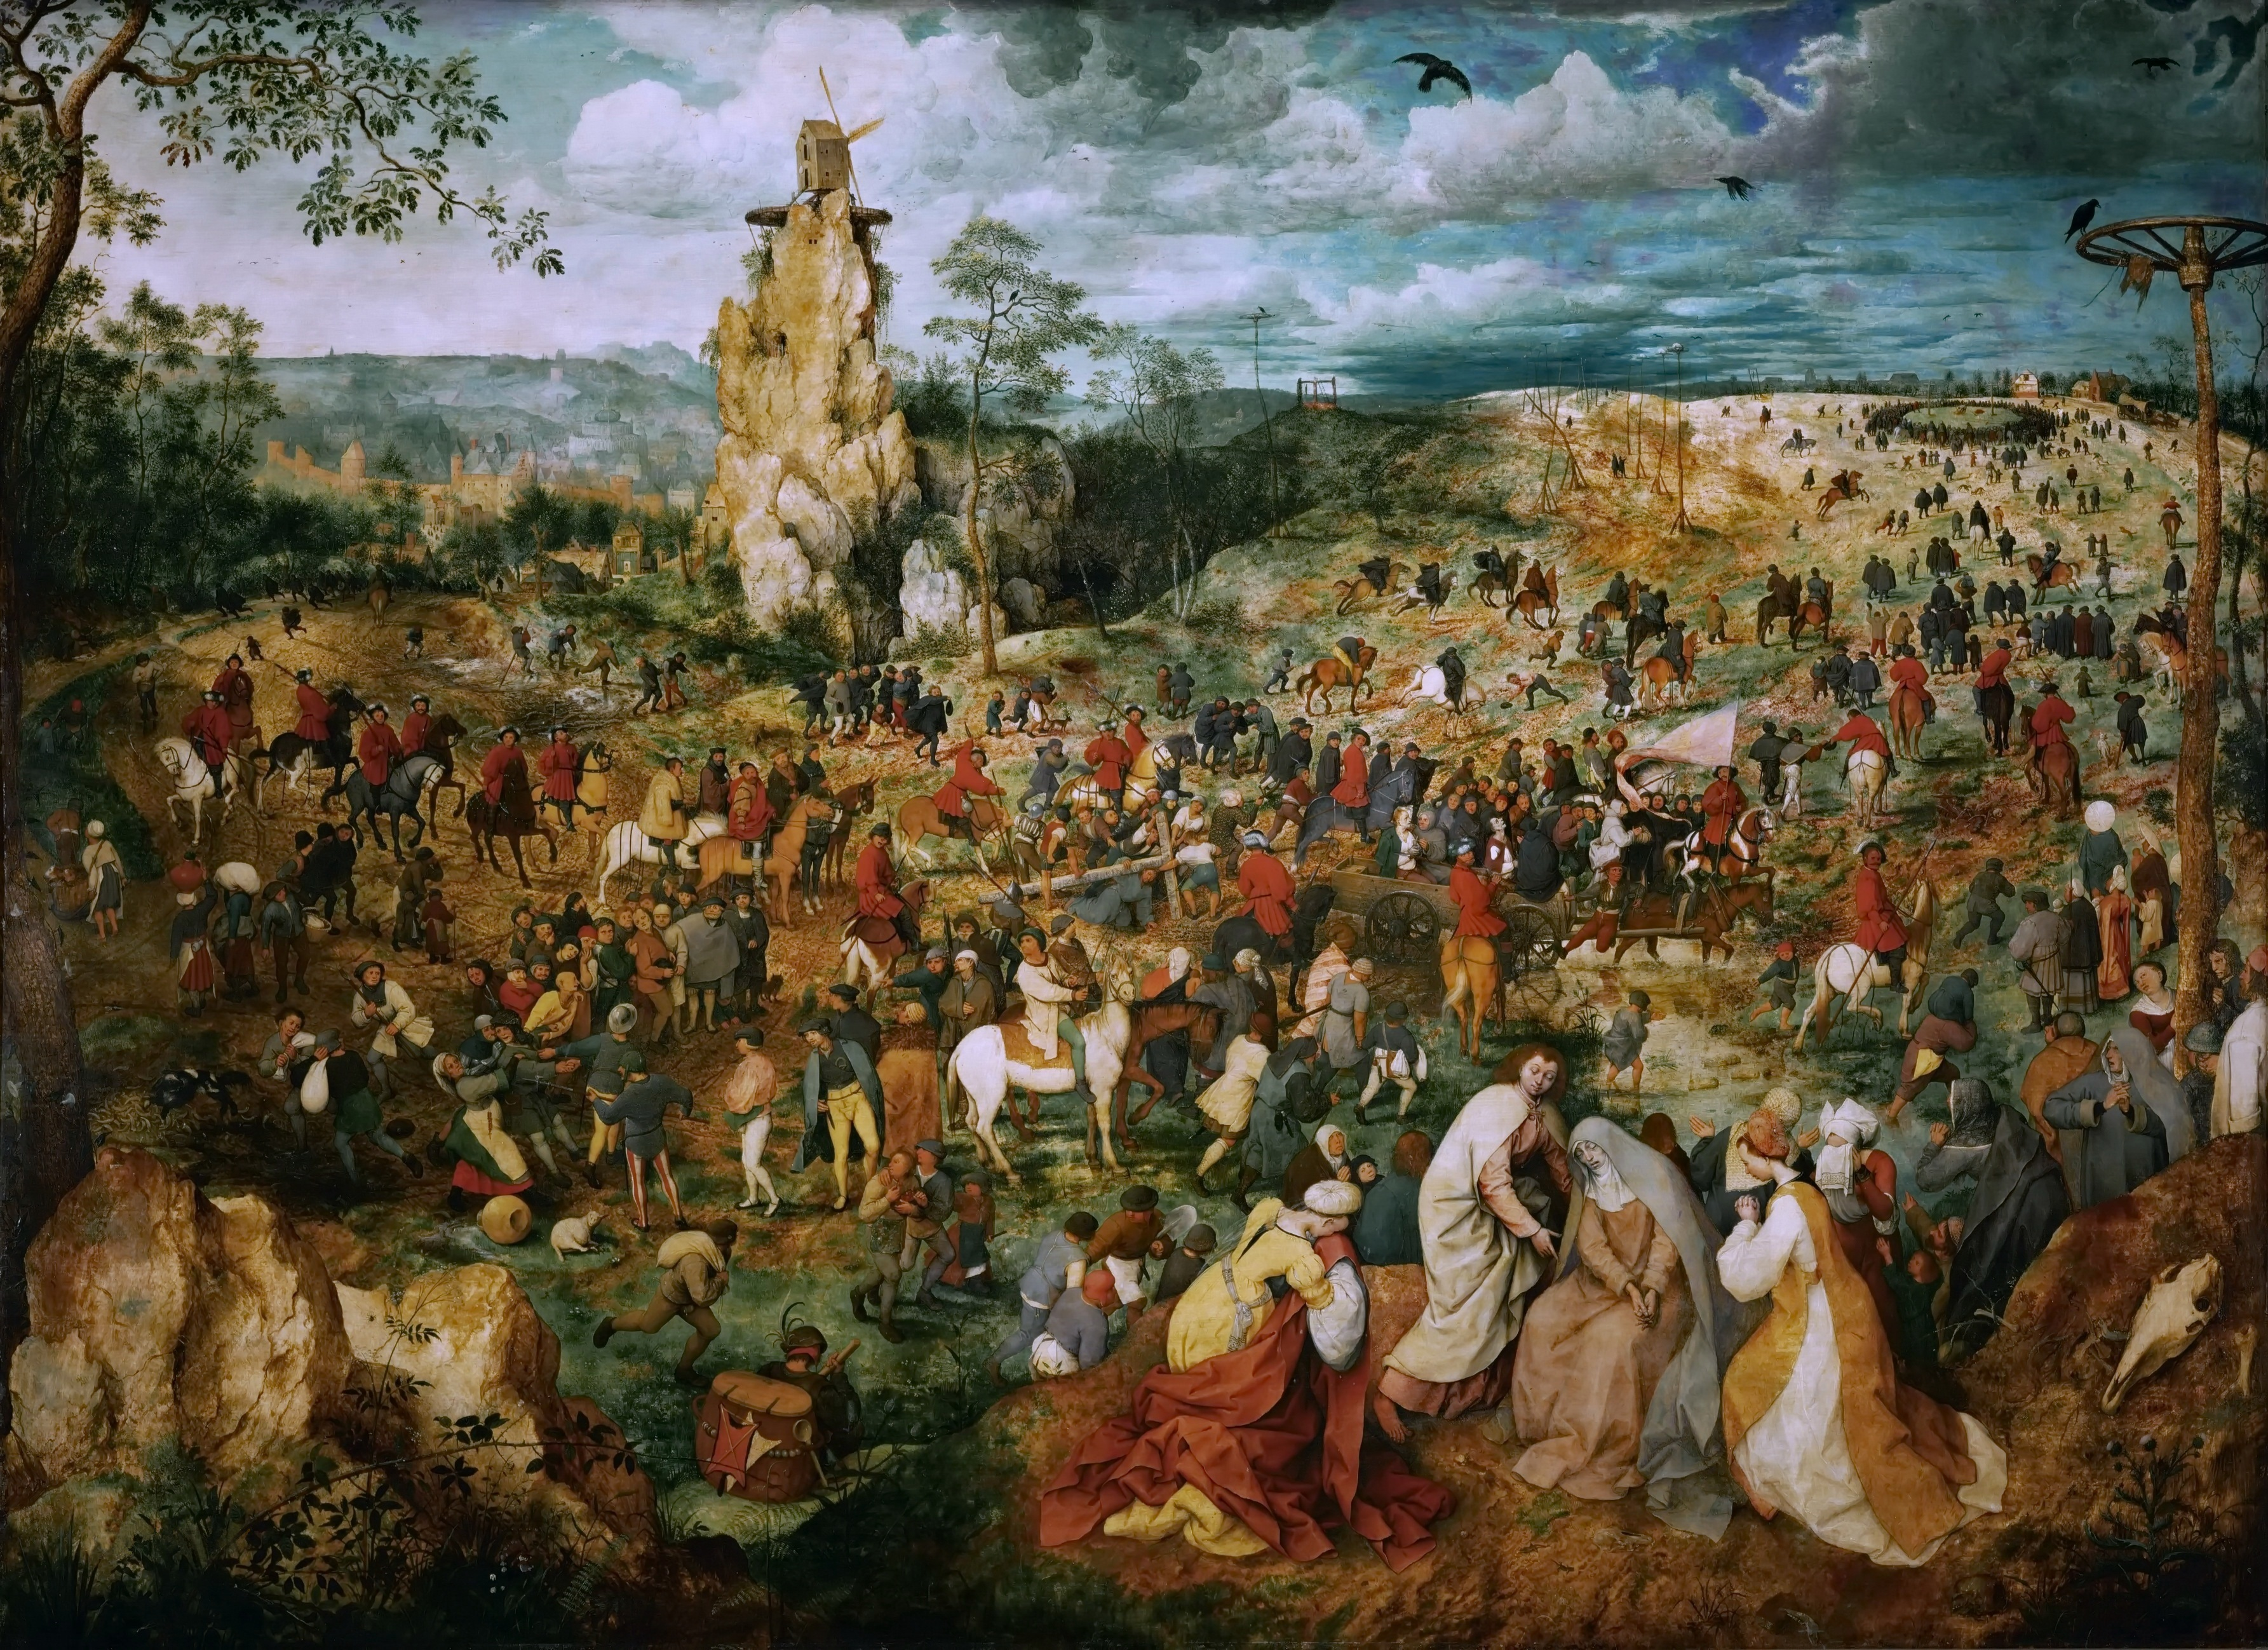 Pieter_Bruegel_(I)_-_The_Procession_to_Calvary_(1564)